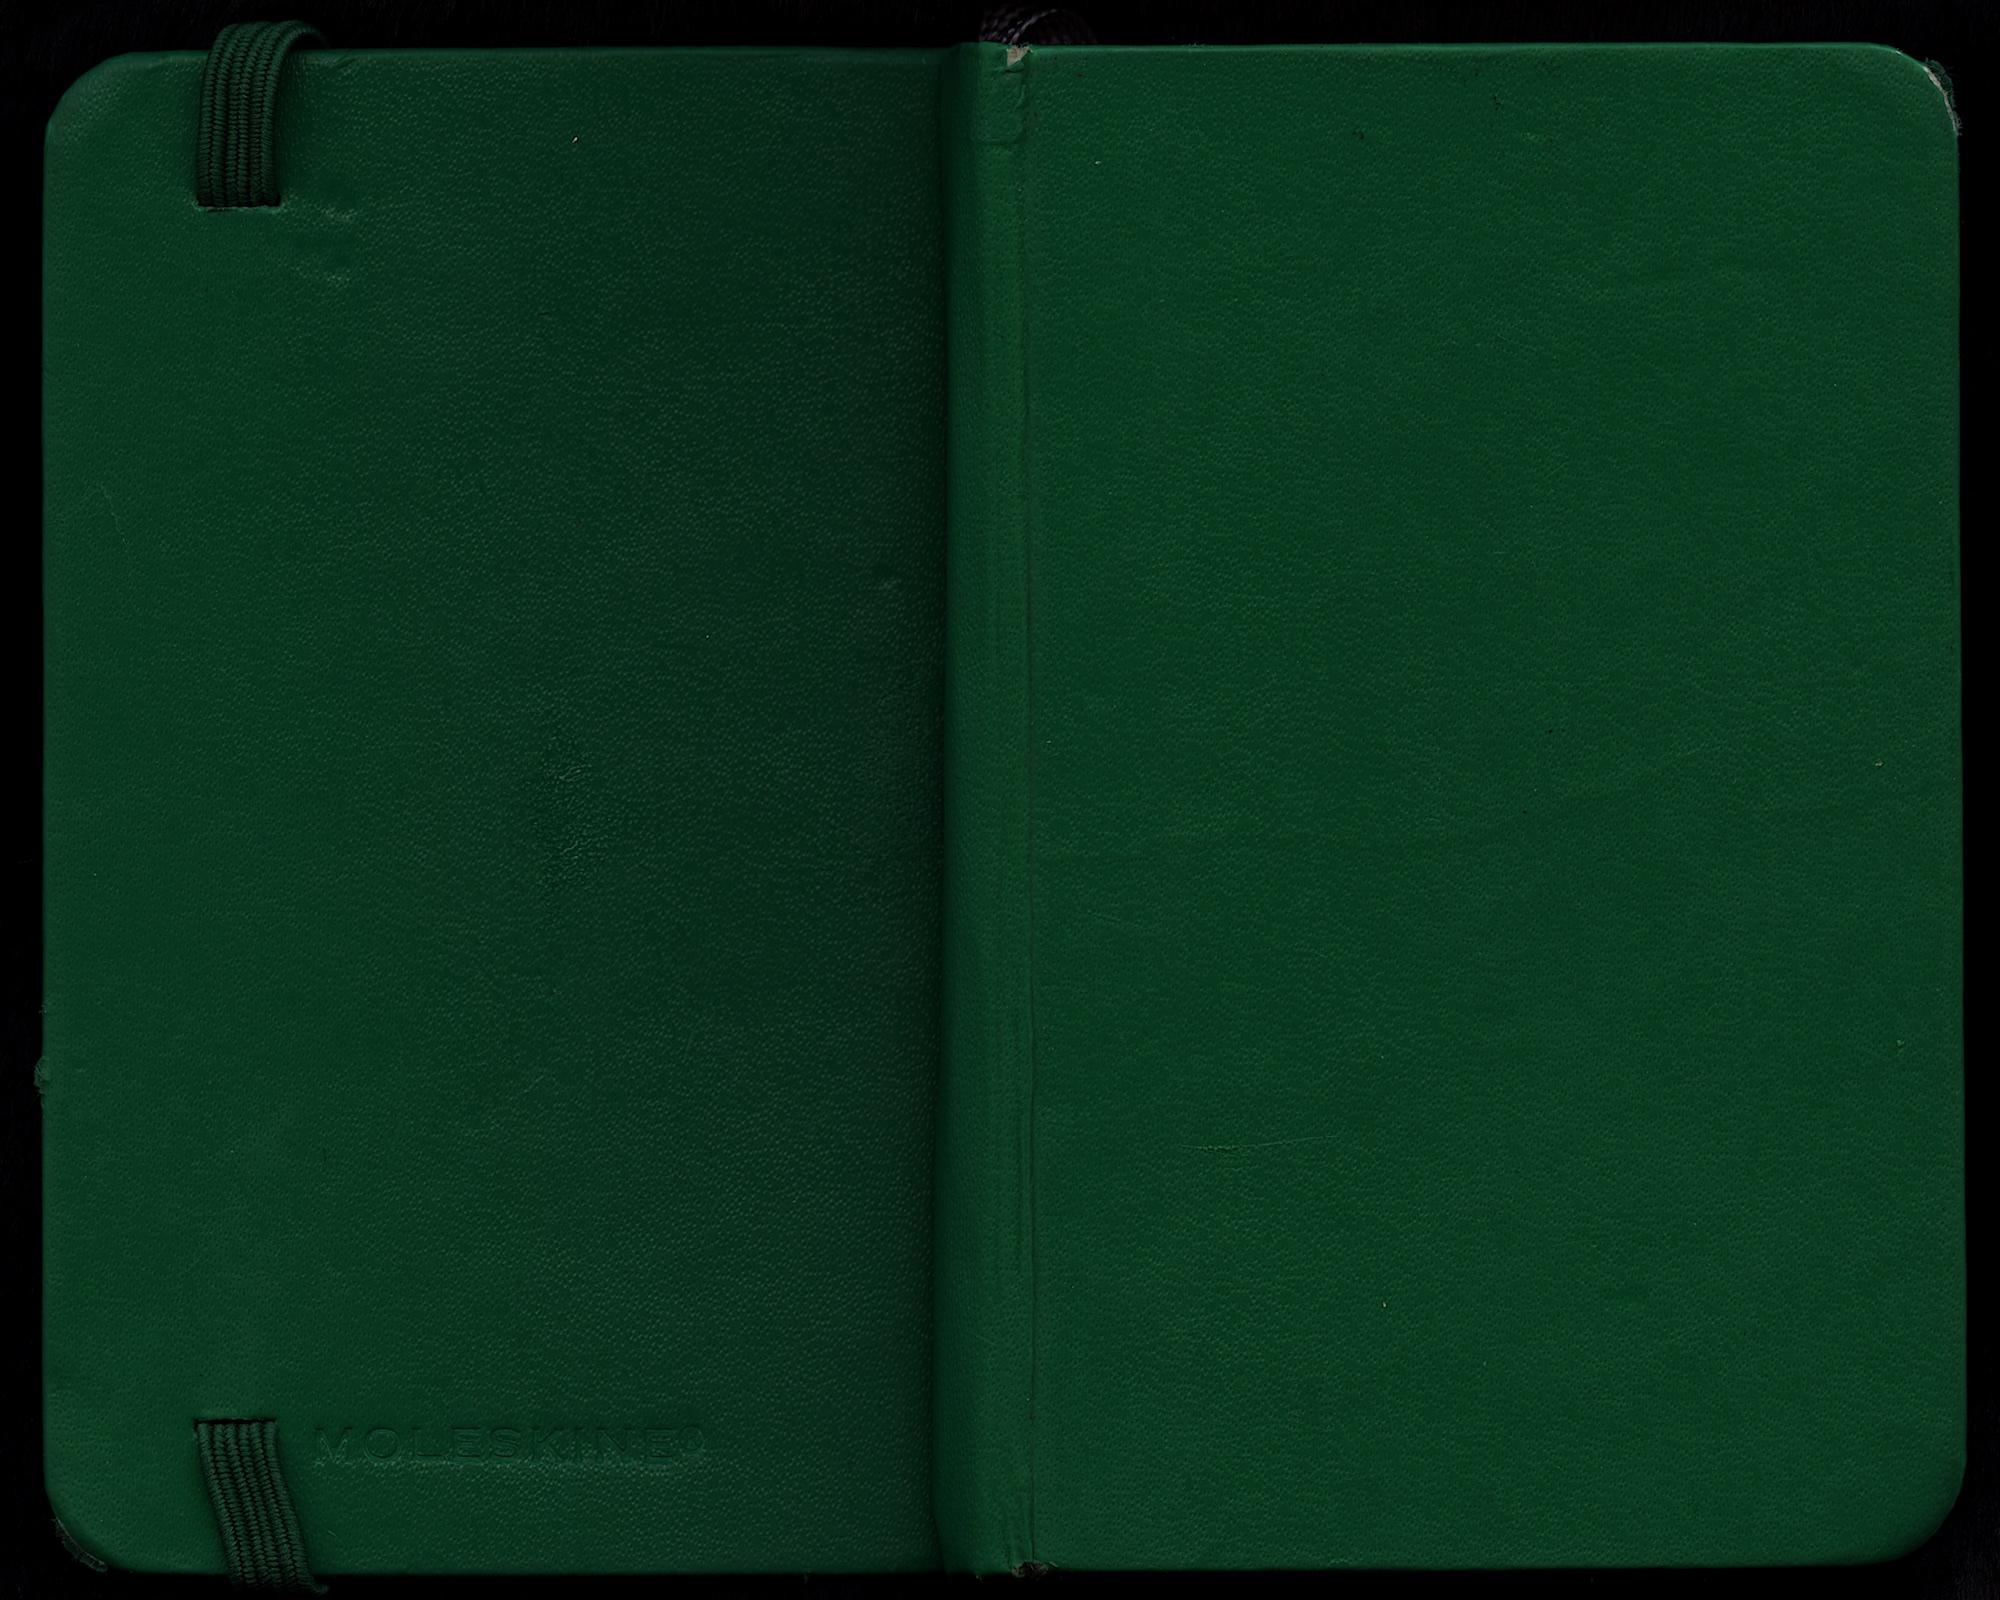 Green moleskin sketchbook